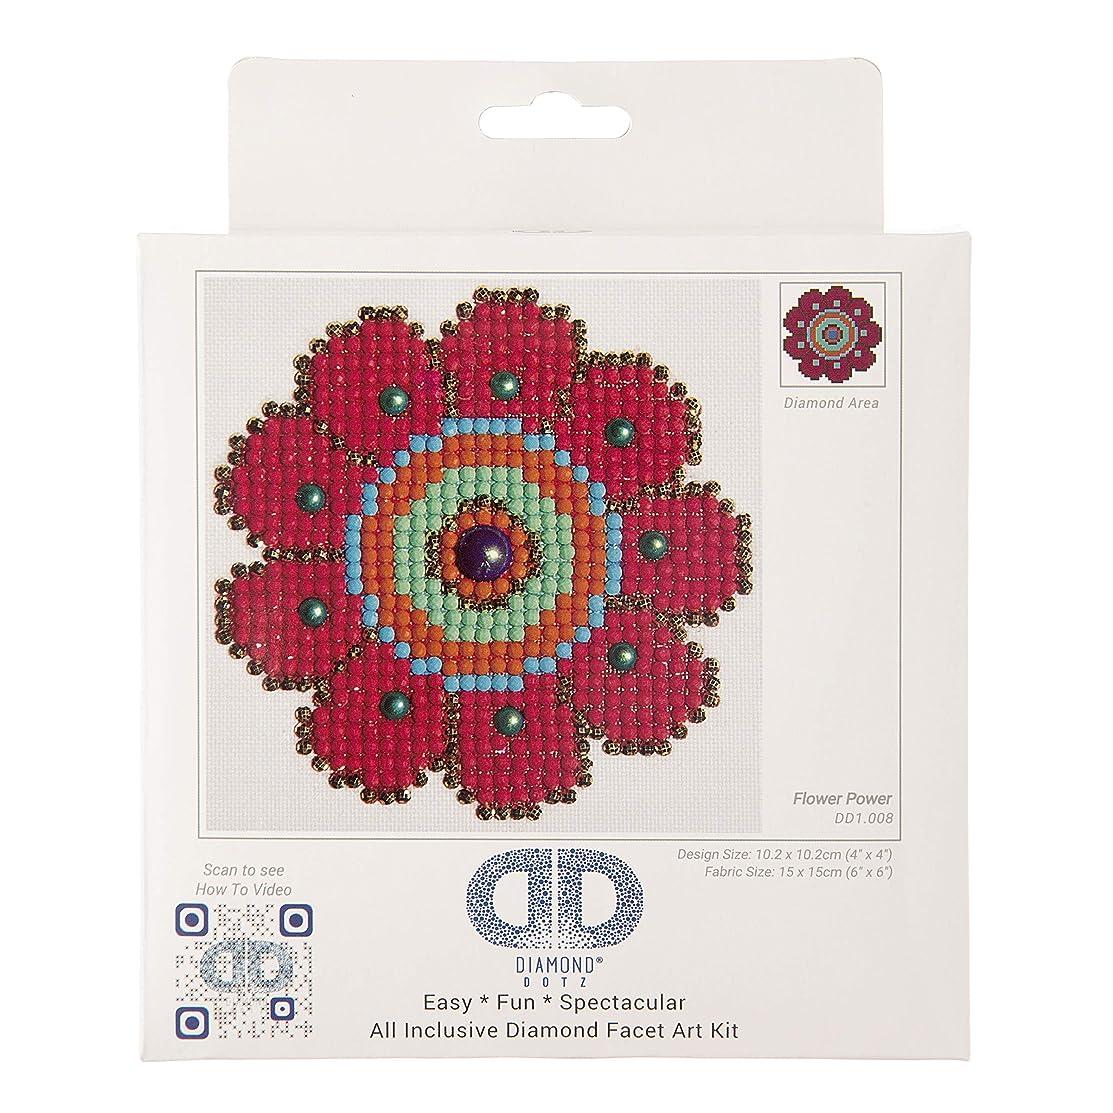 Needleart World Flower Power Diamond Embroidery Kit